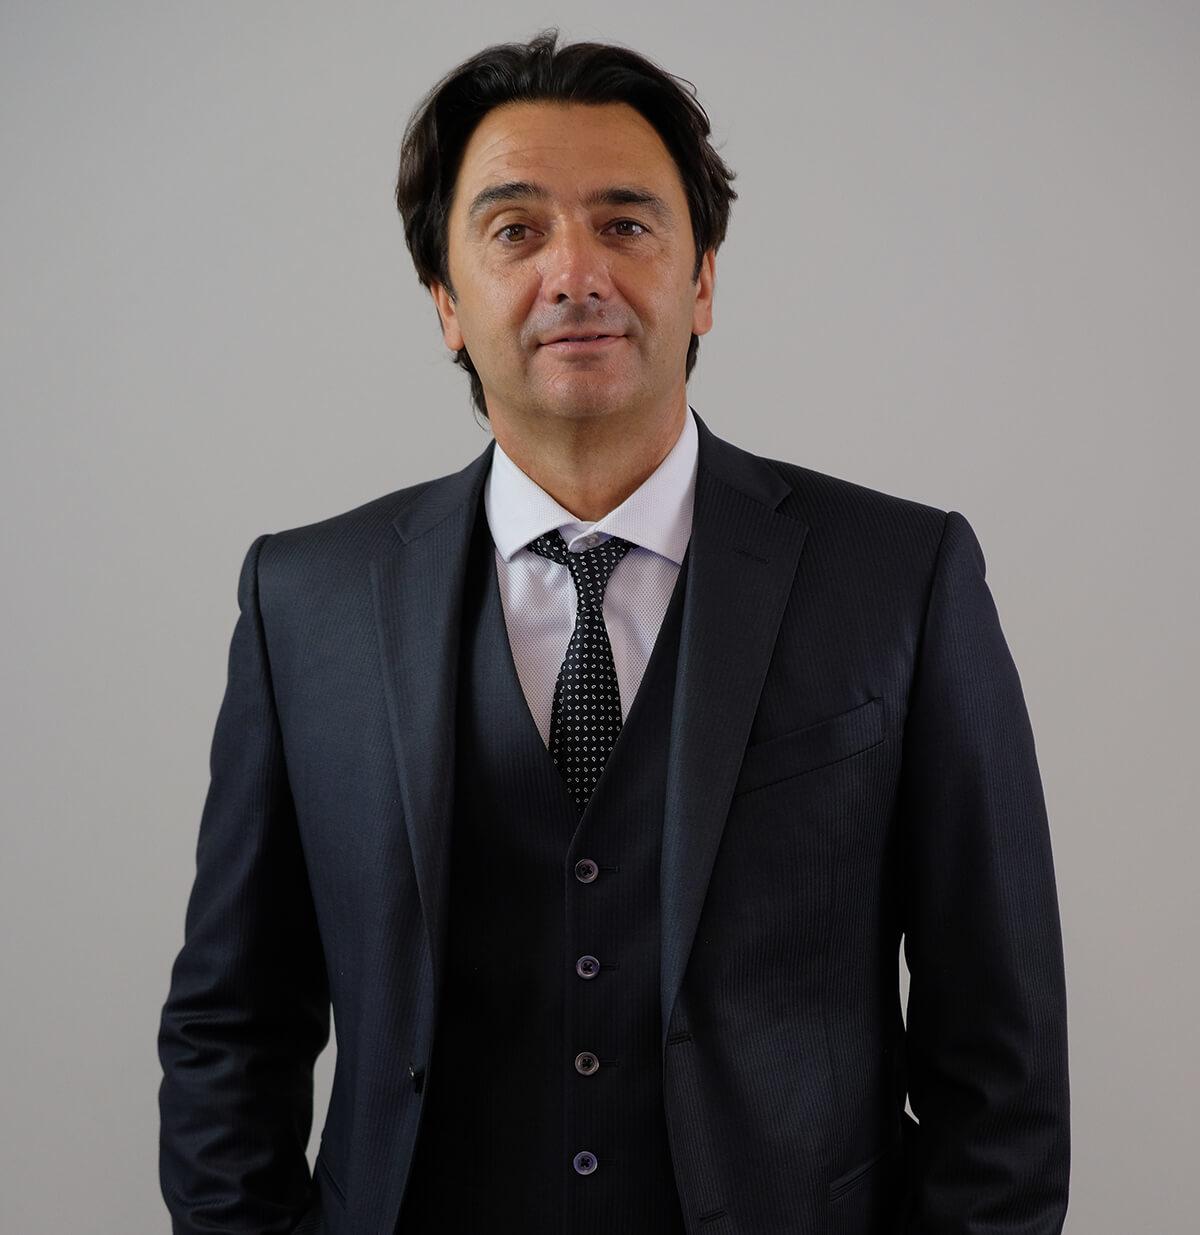 Marco Biancardi